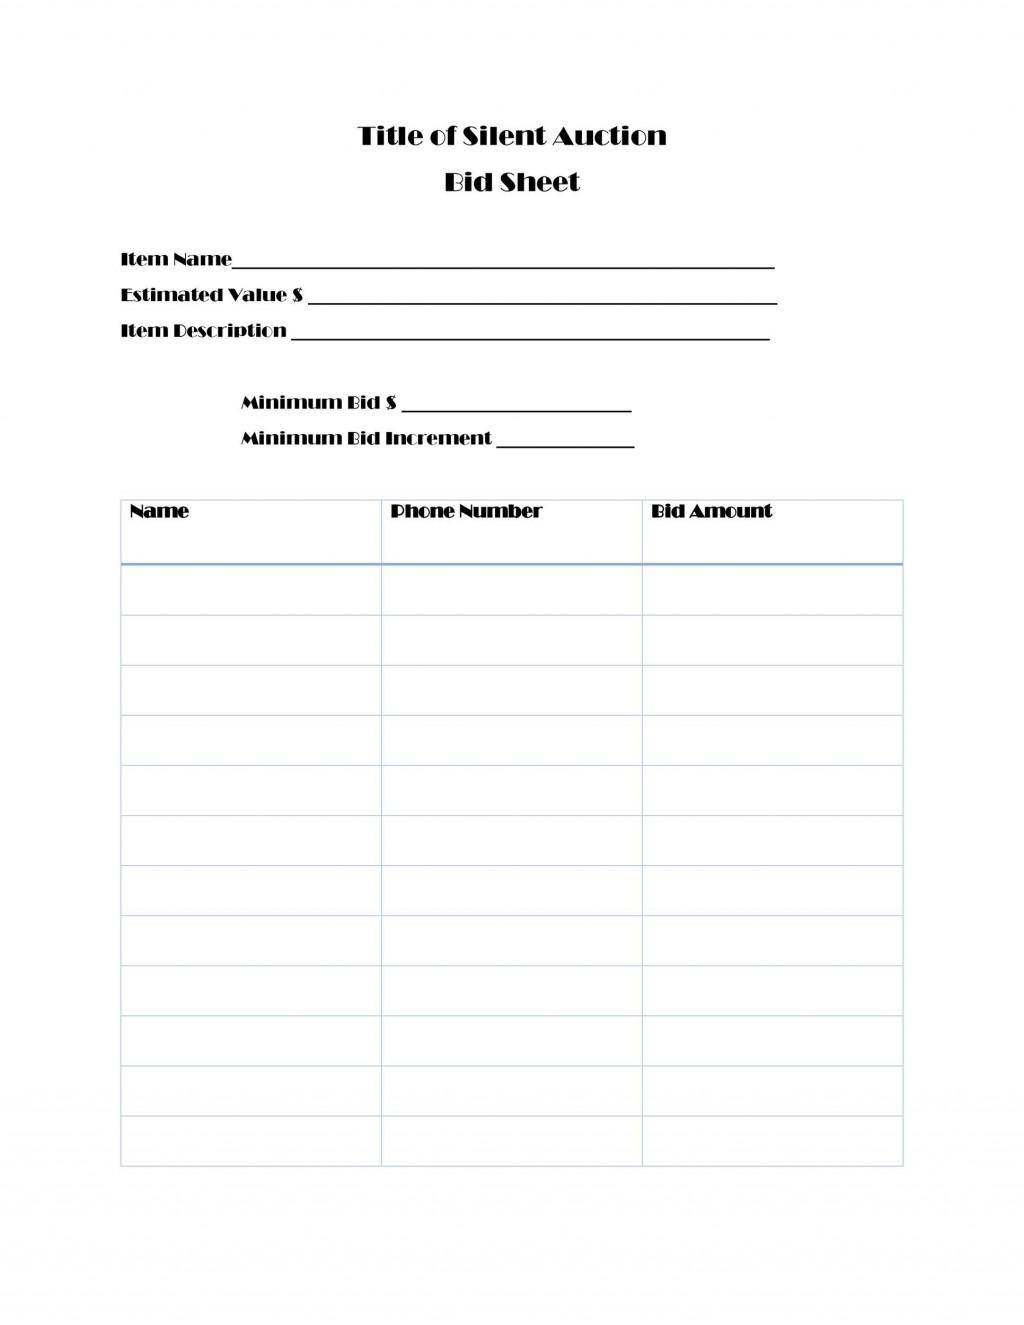 003 Impressive Sample Silent Auction Bid Sheet Free Photo  Printable Template DownloadLarge